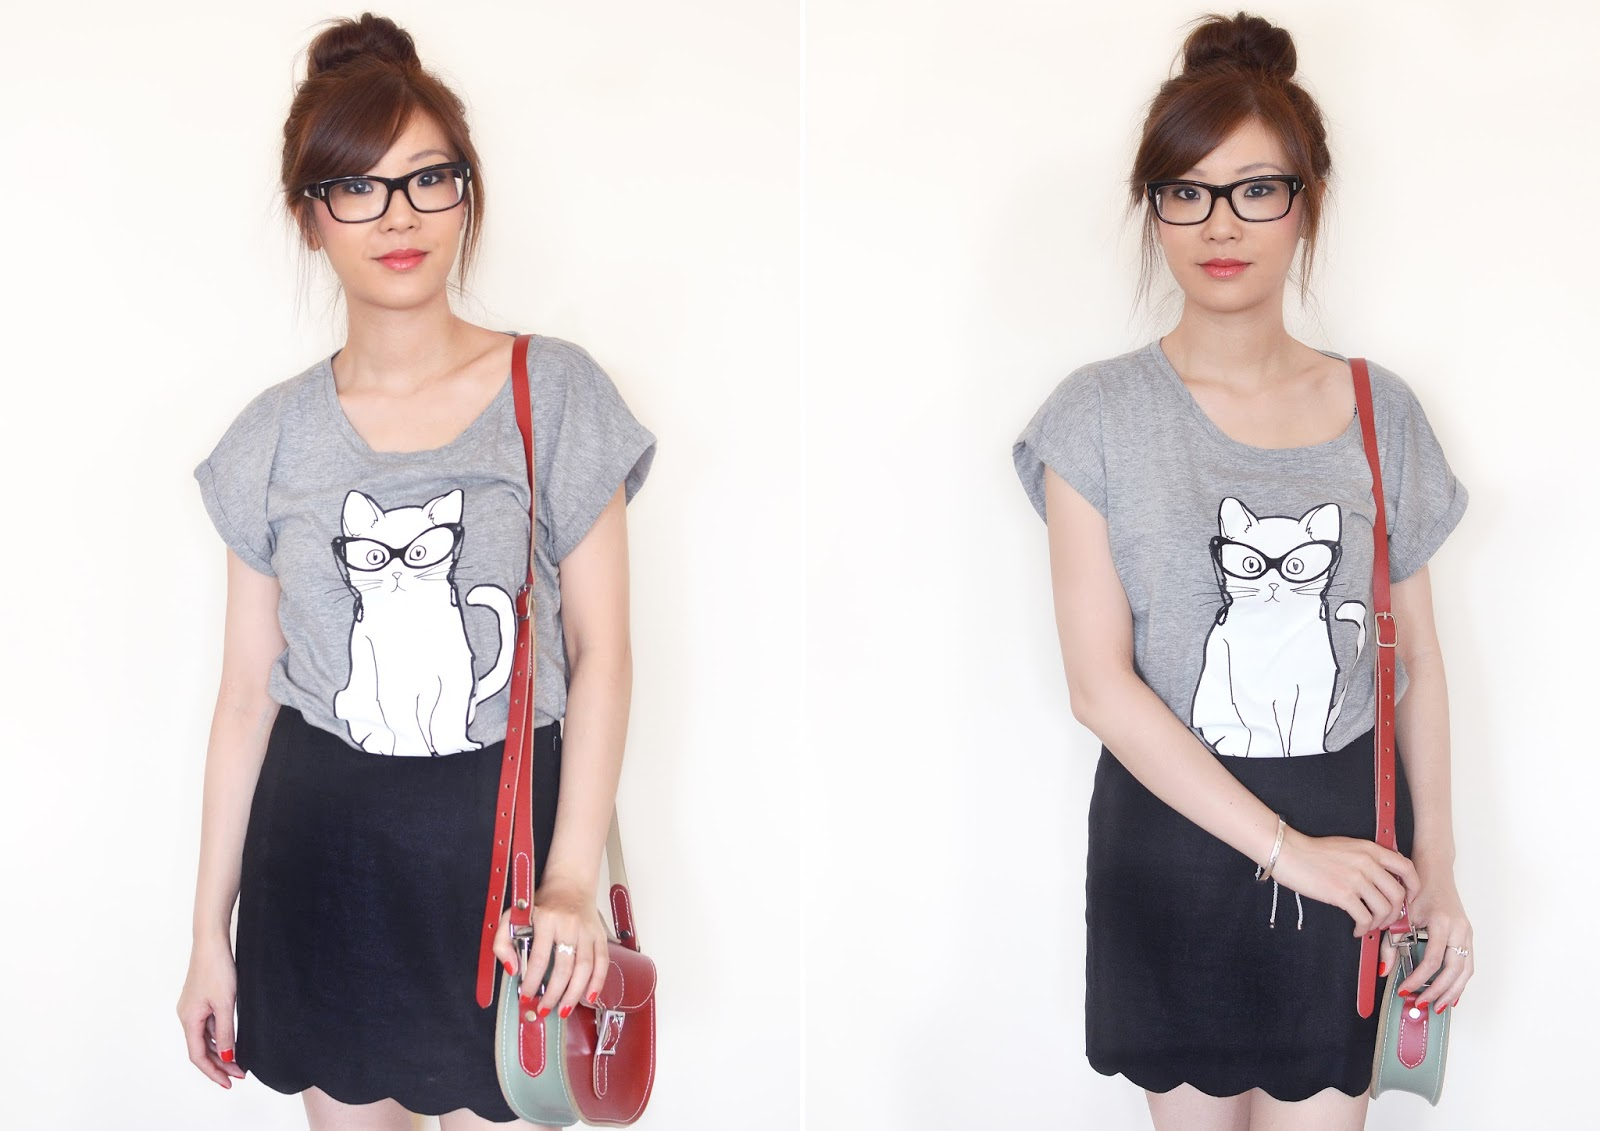 fashion blog uk, styling a grey tshirt, grey tshirt with black skirt